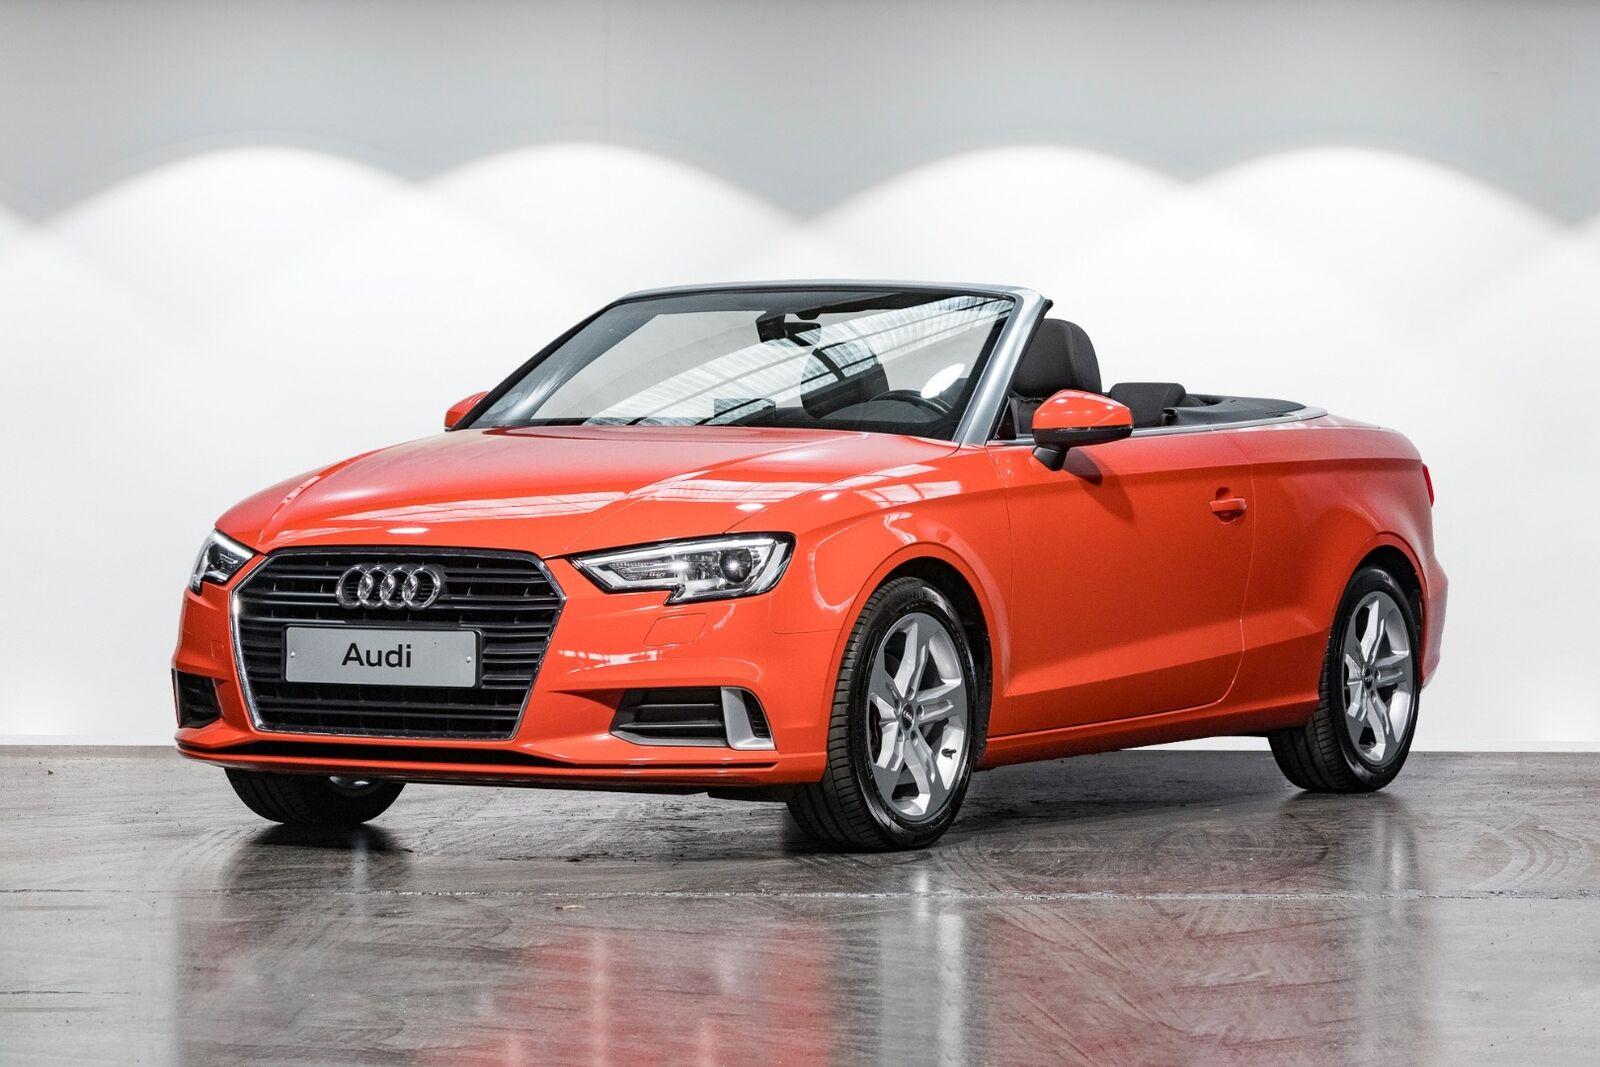 Audi A3 1,5 TFSi 150 Sport Cabriolet S-tr. 2d - 339.900 kr.